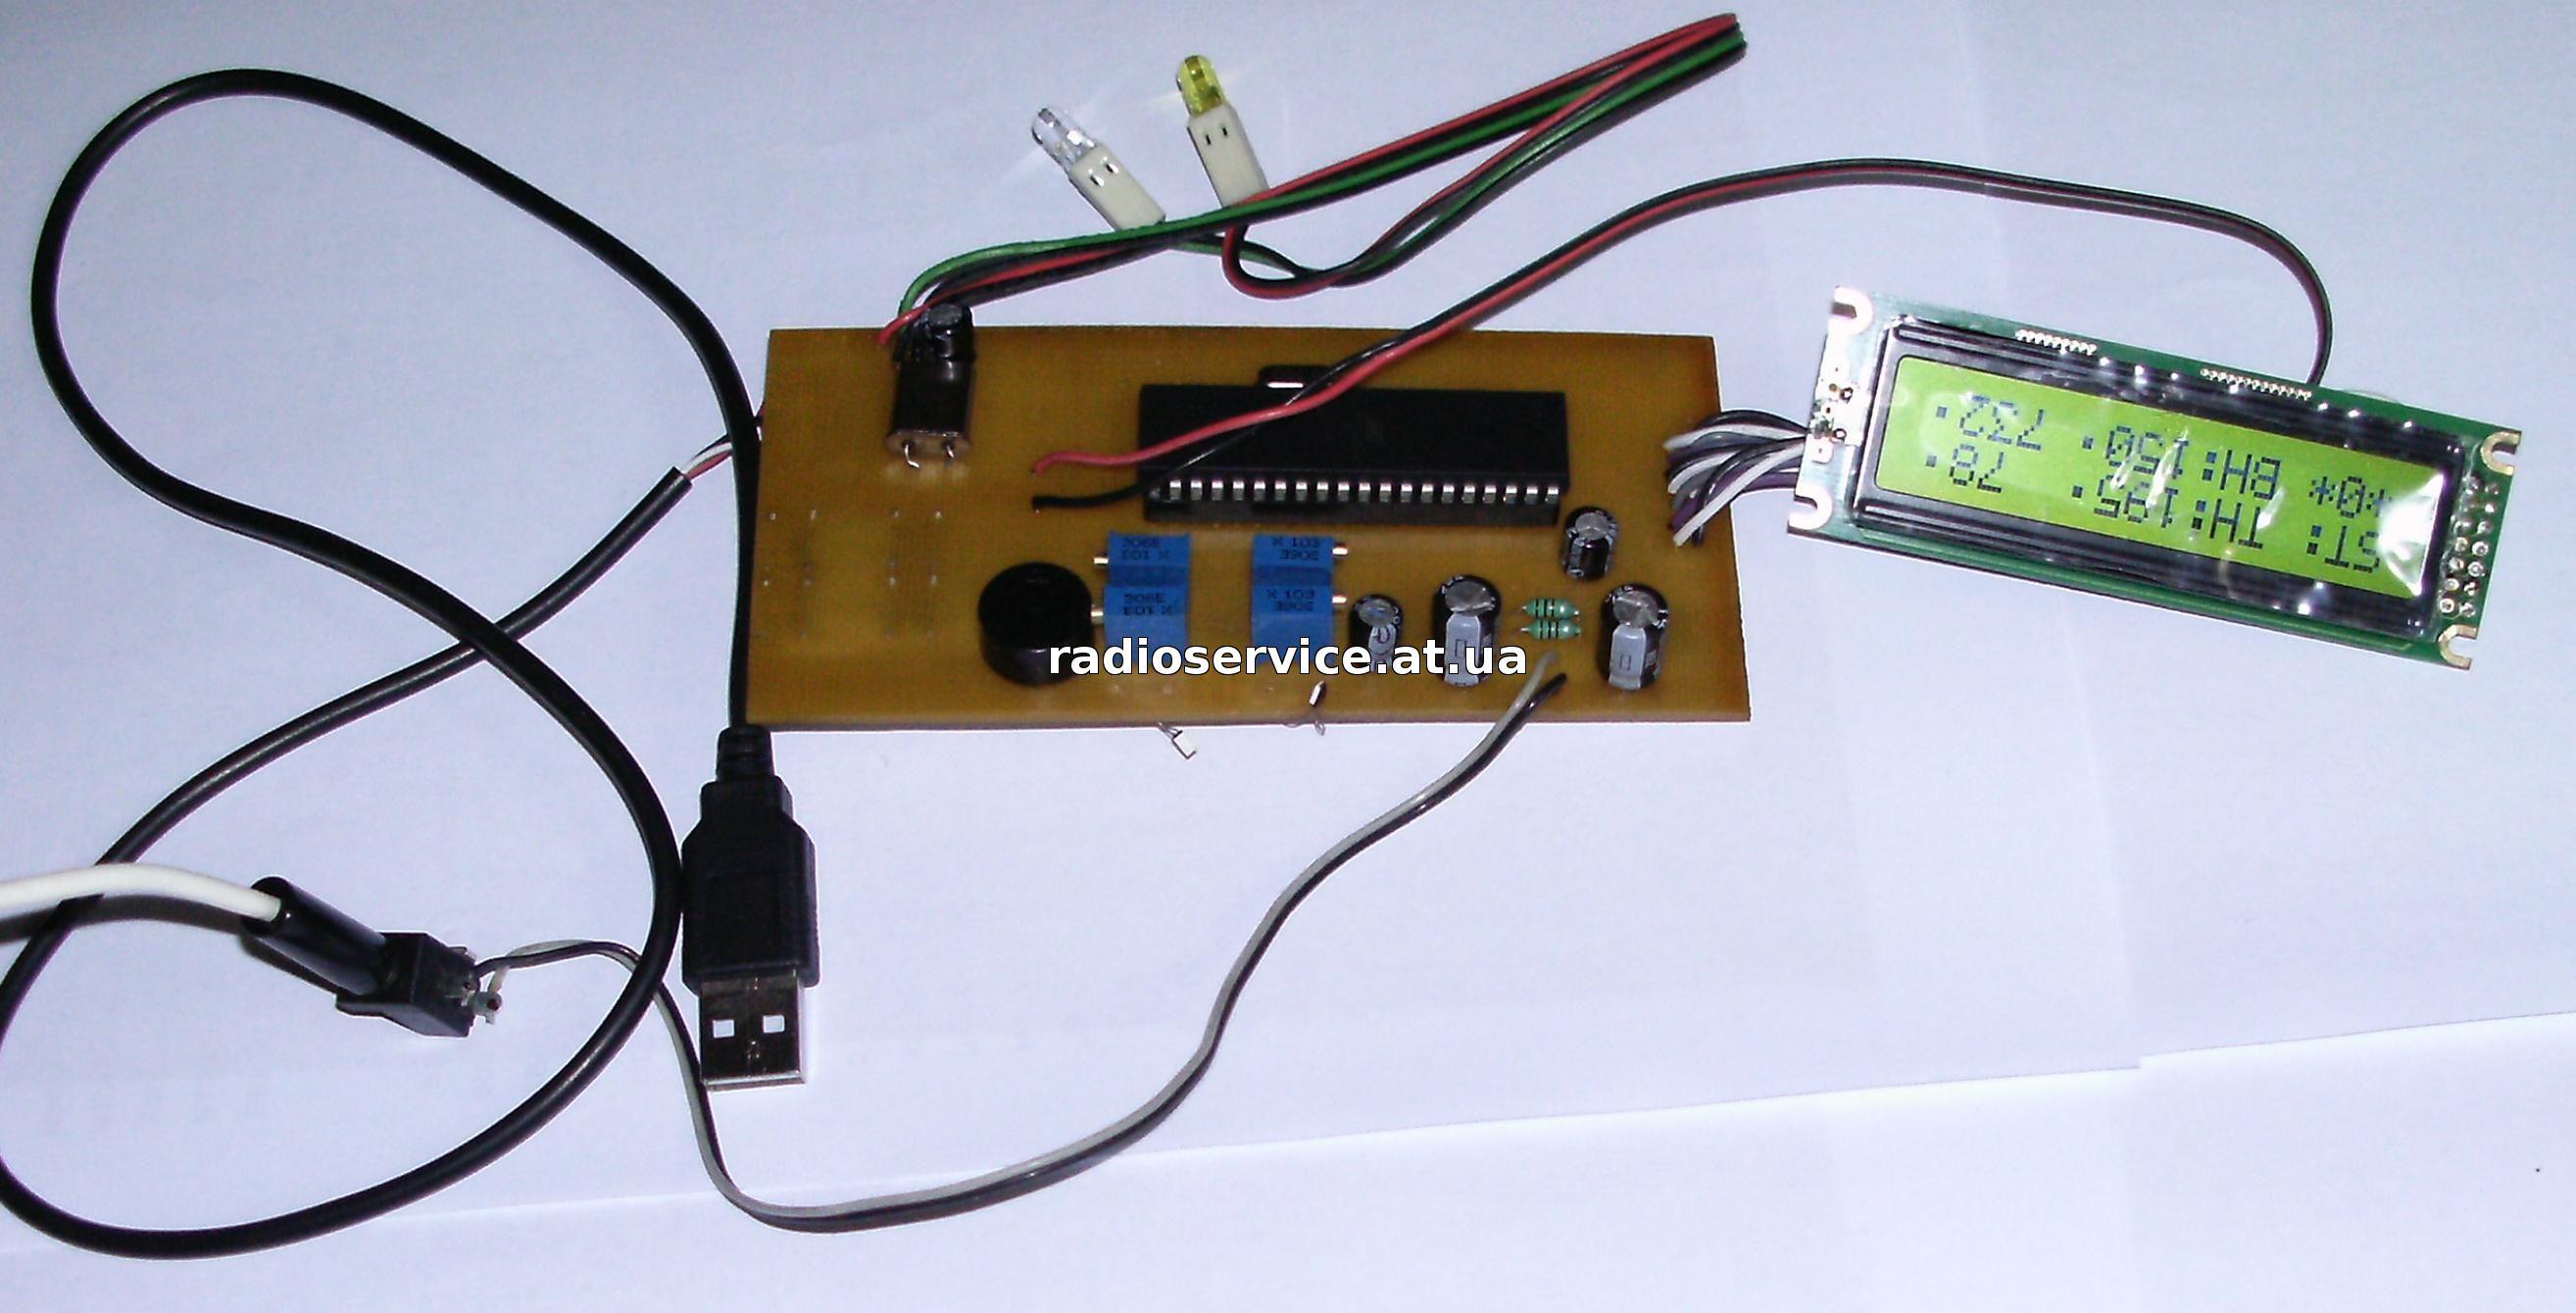 USB-CAN интерфейс, или просто CAN хакер своими руками 24